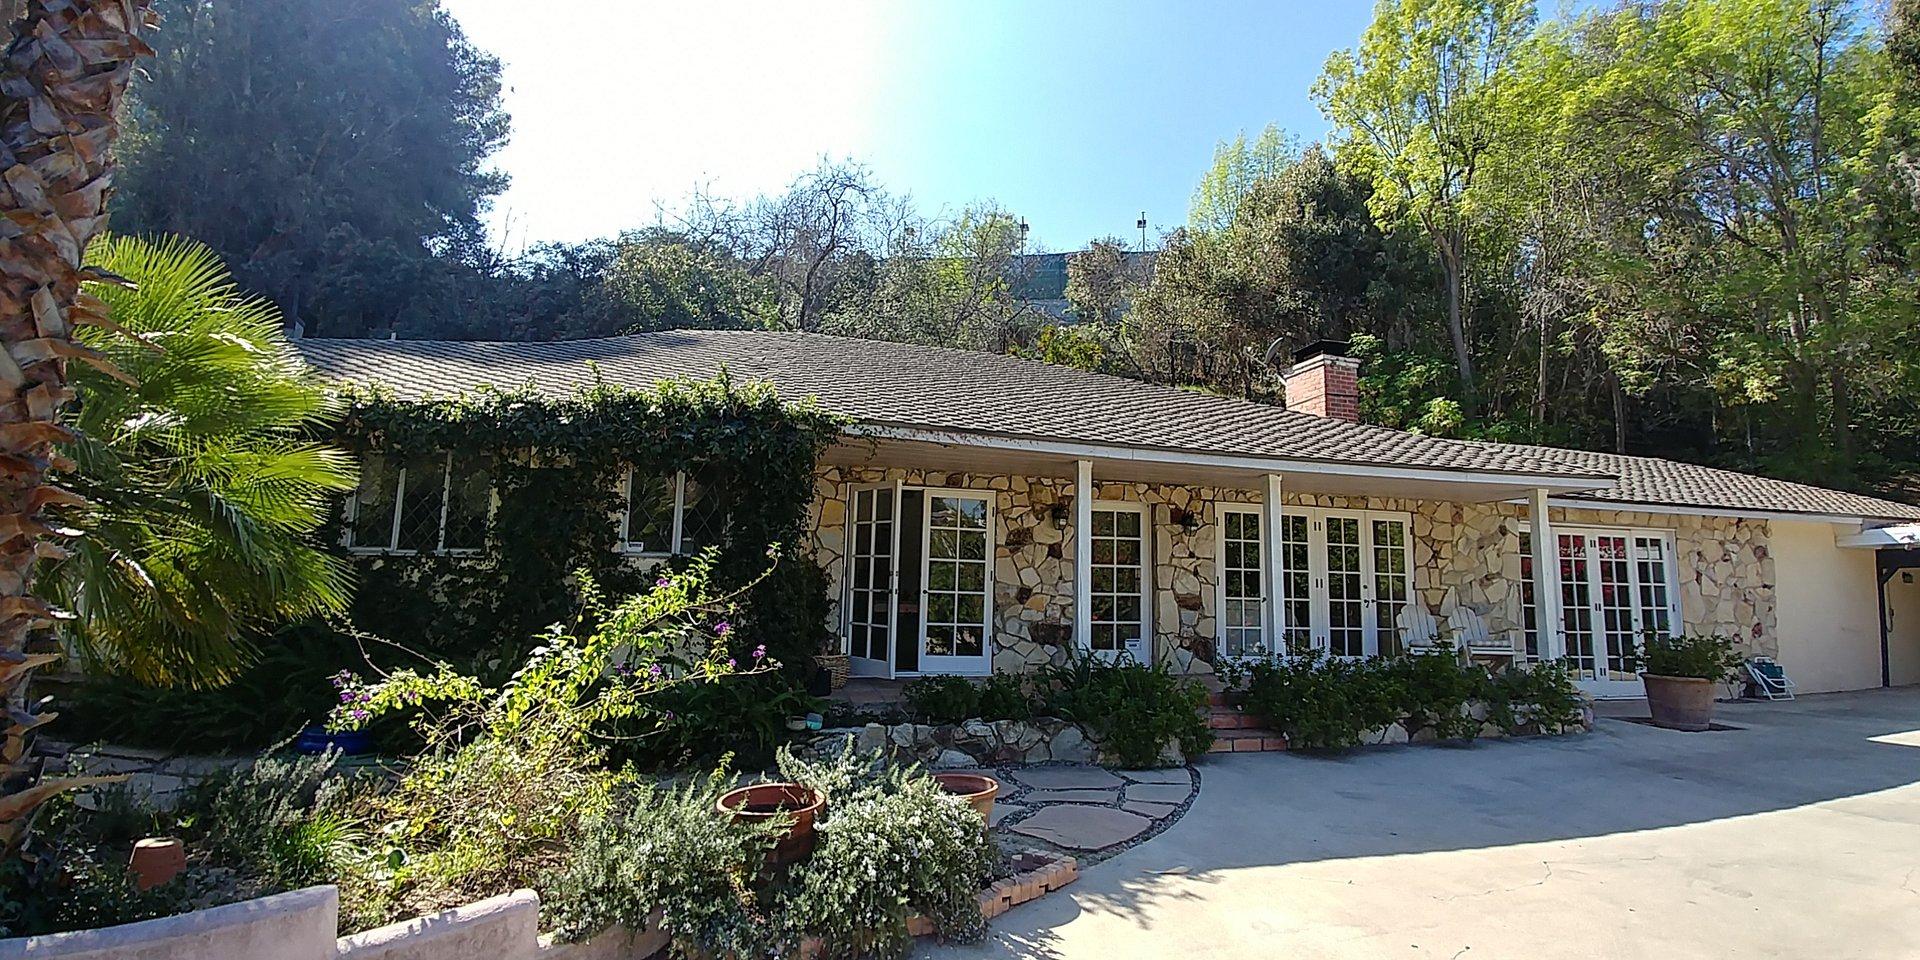 Coldwell Banker Residential Brokerage Lists Sherman Oaks Property for $1.699 Million